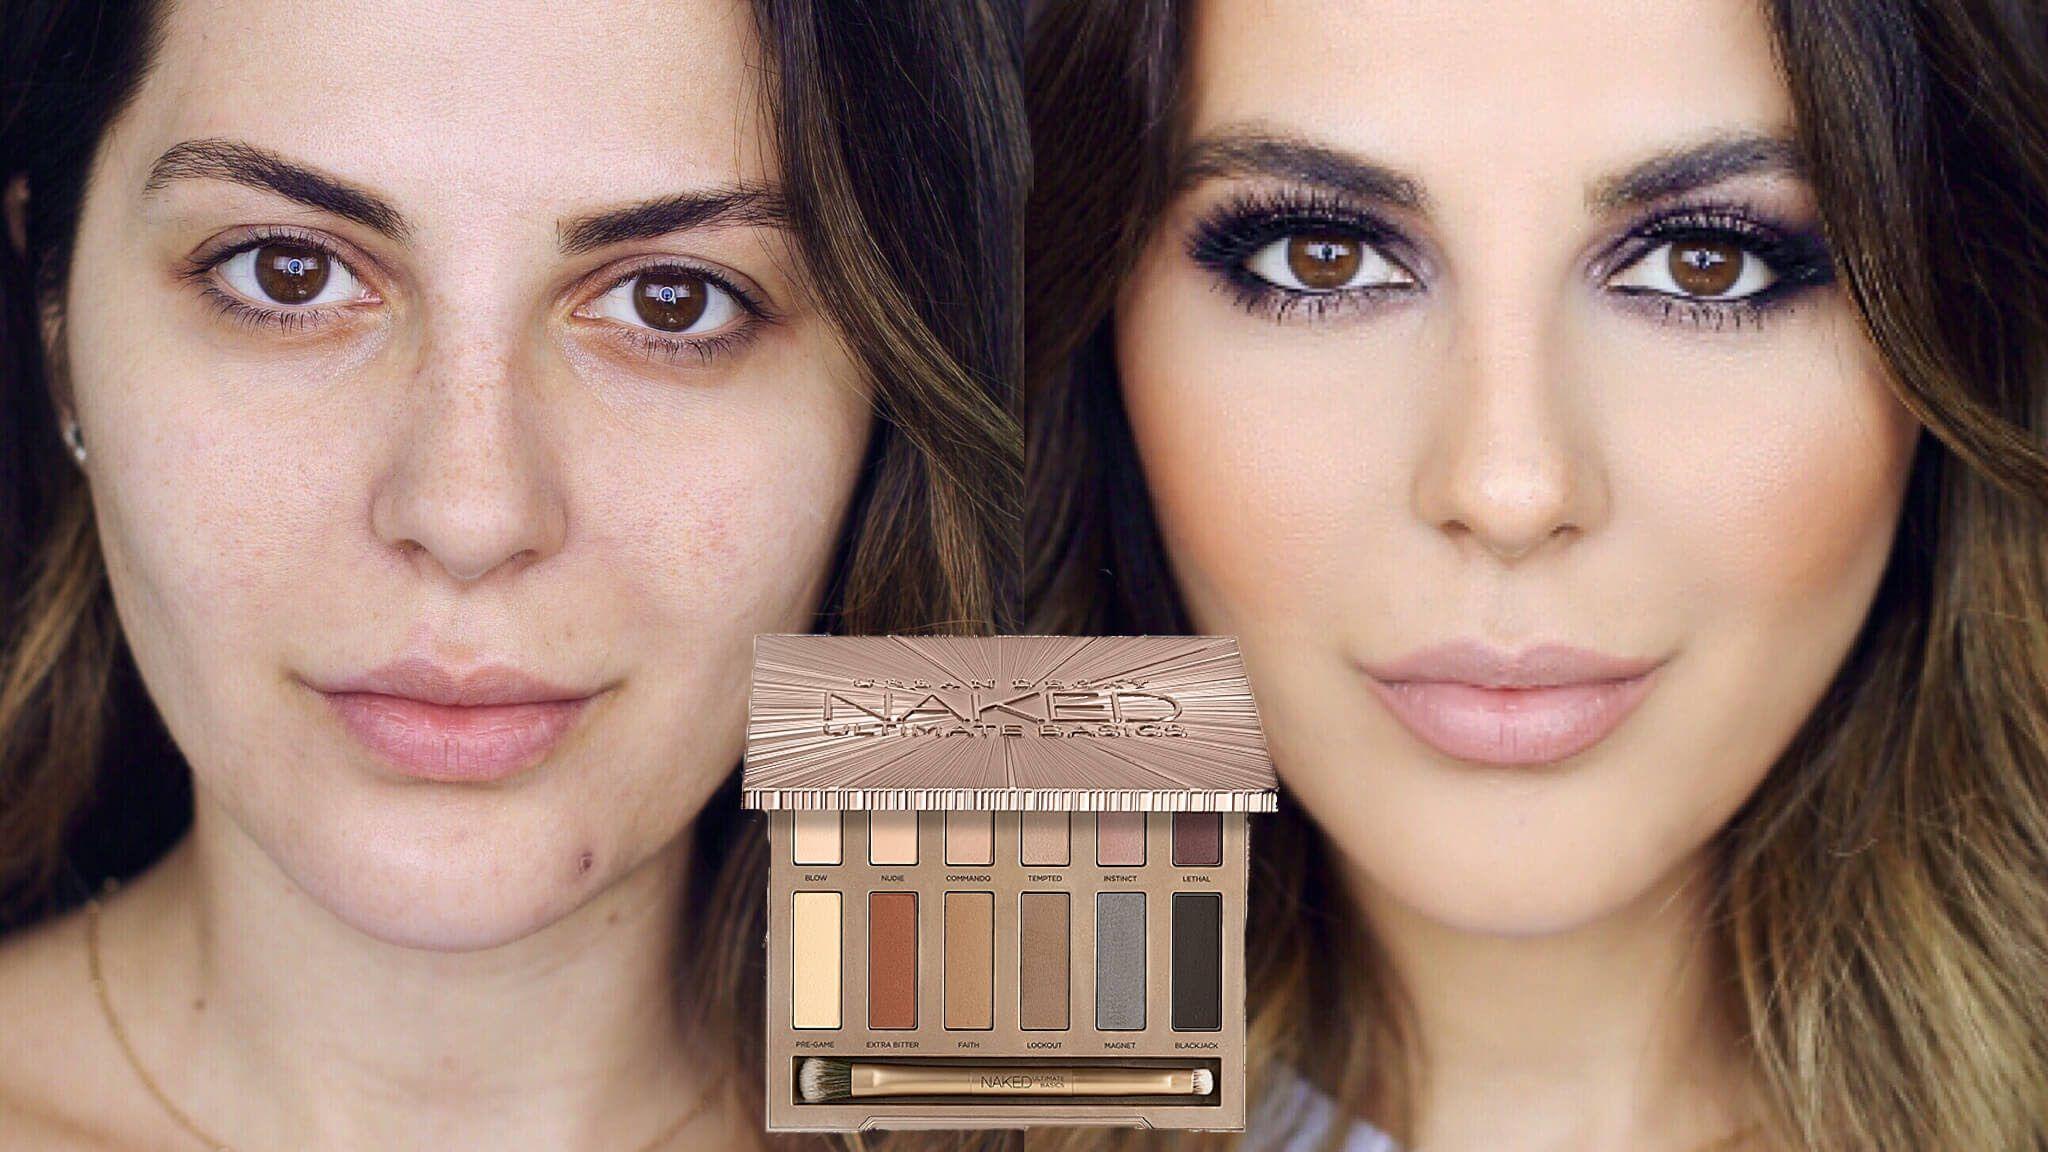 8bbfaf62ee2 Urban Decay Naked Ultimate Basics Palette I Makeup Tutorial 2016 I Sona  Gasparian - YouTube